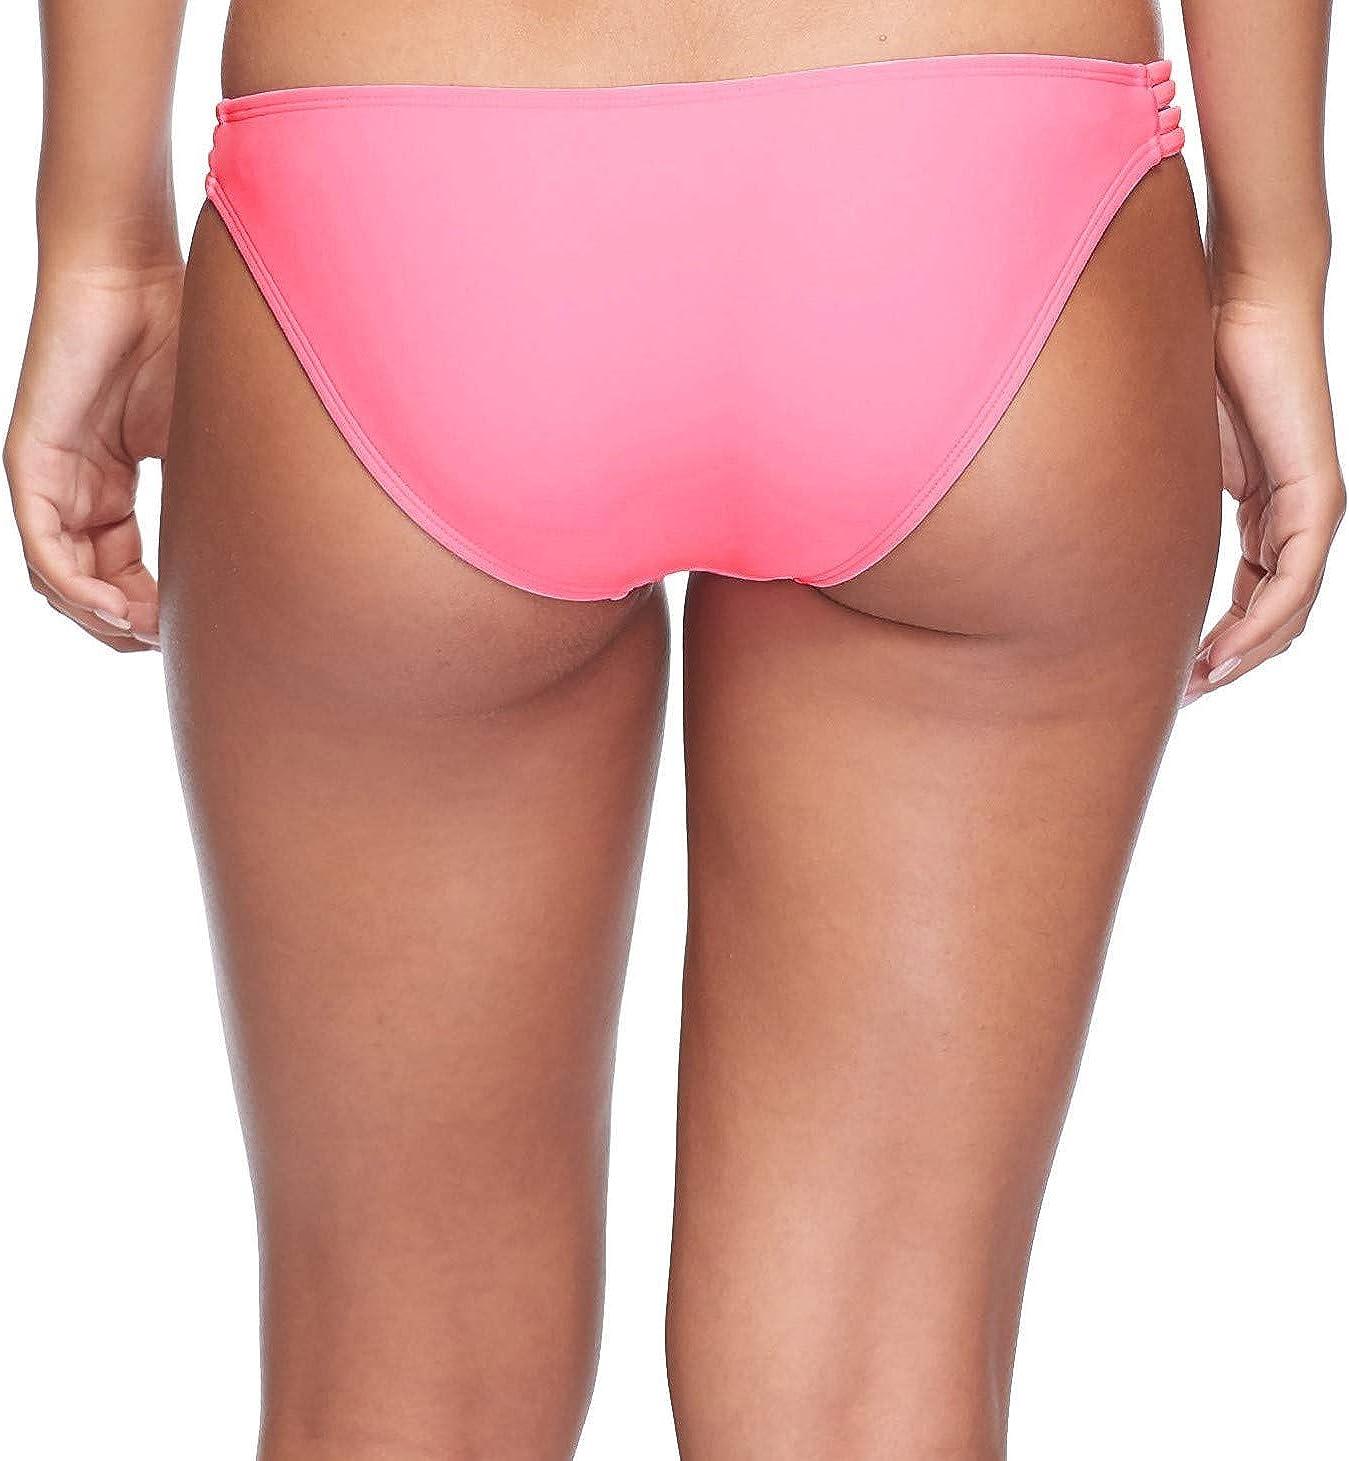 Body Glove Womens Smoothies Flirty Surf Rider Solid Bikini Bottom Swimsuit